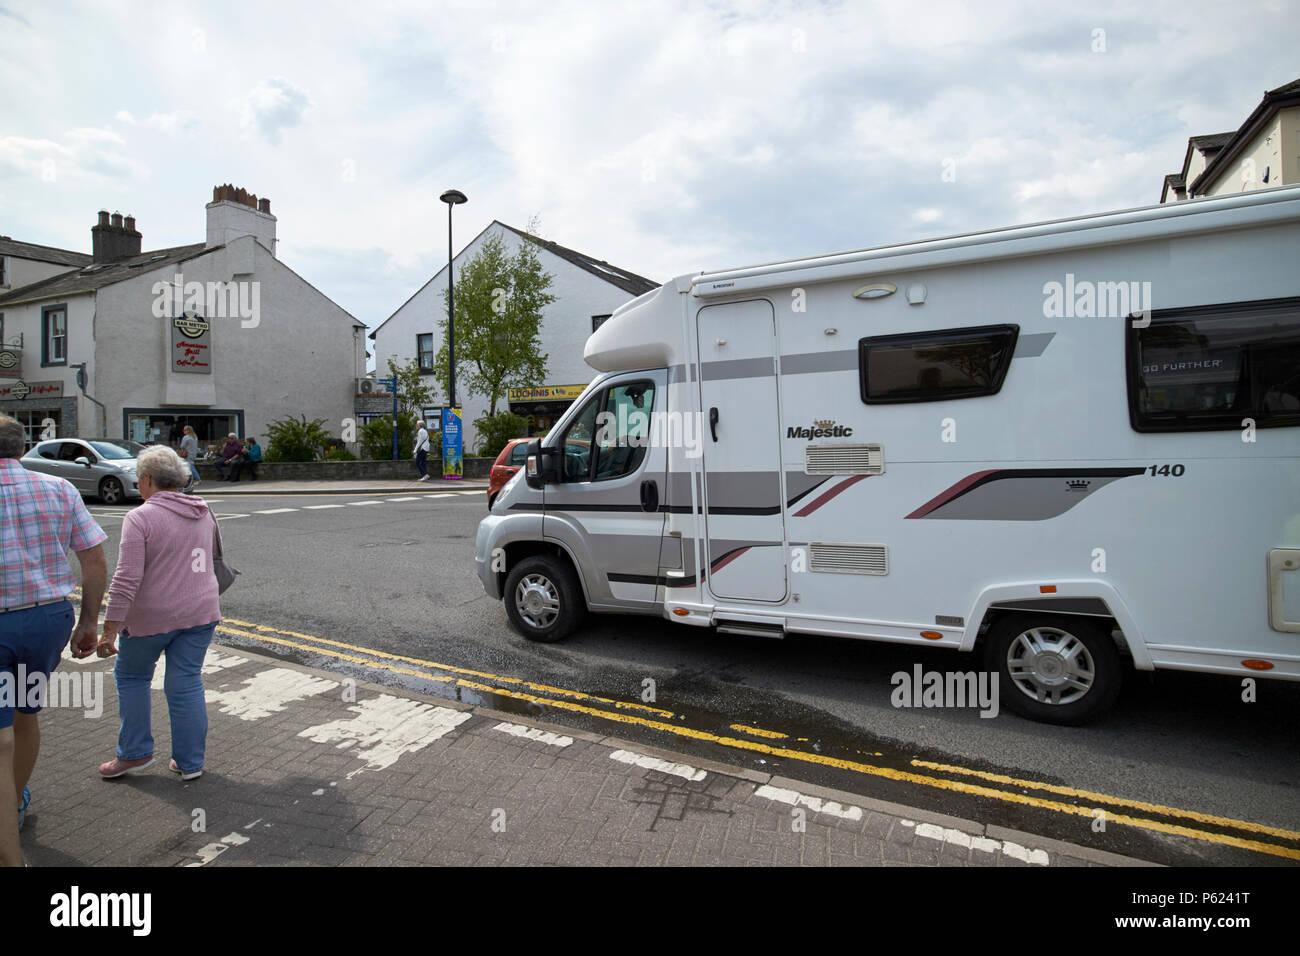 motorhome on mini roundabout in the town of Keswick Lake District Cumbria England UK - Stock Image